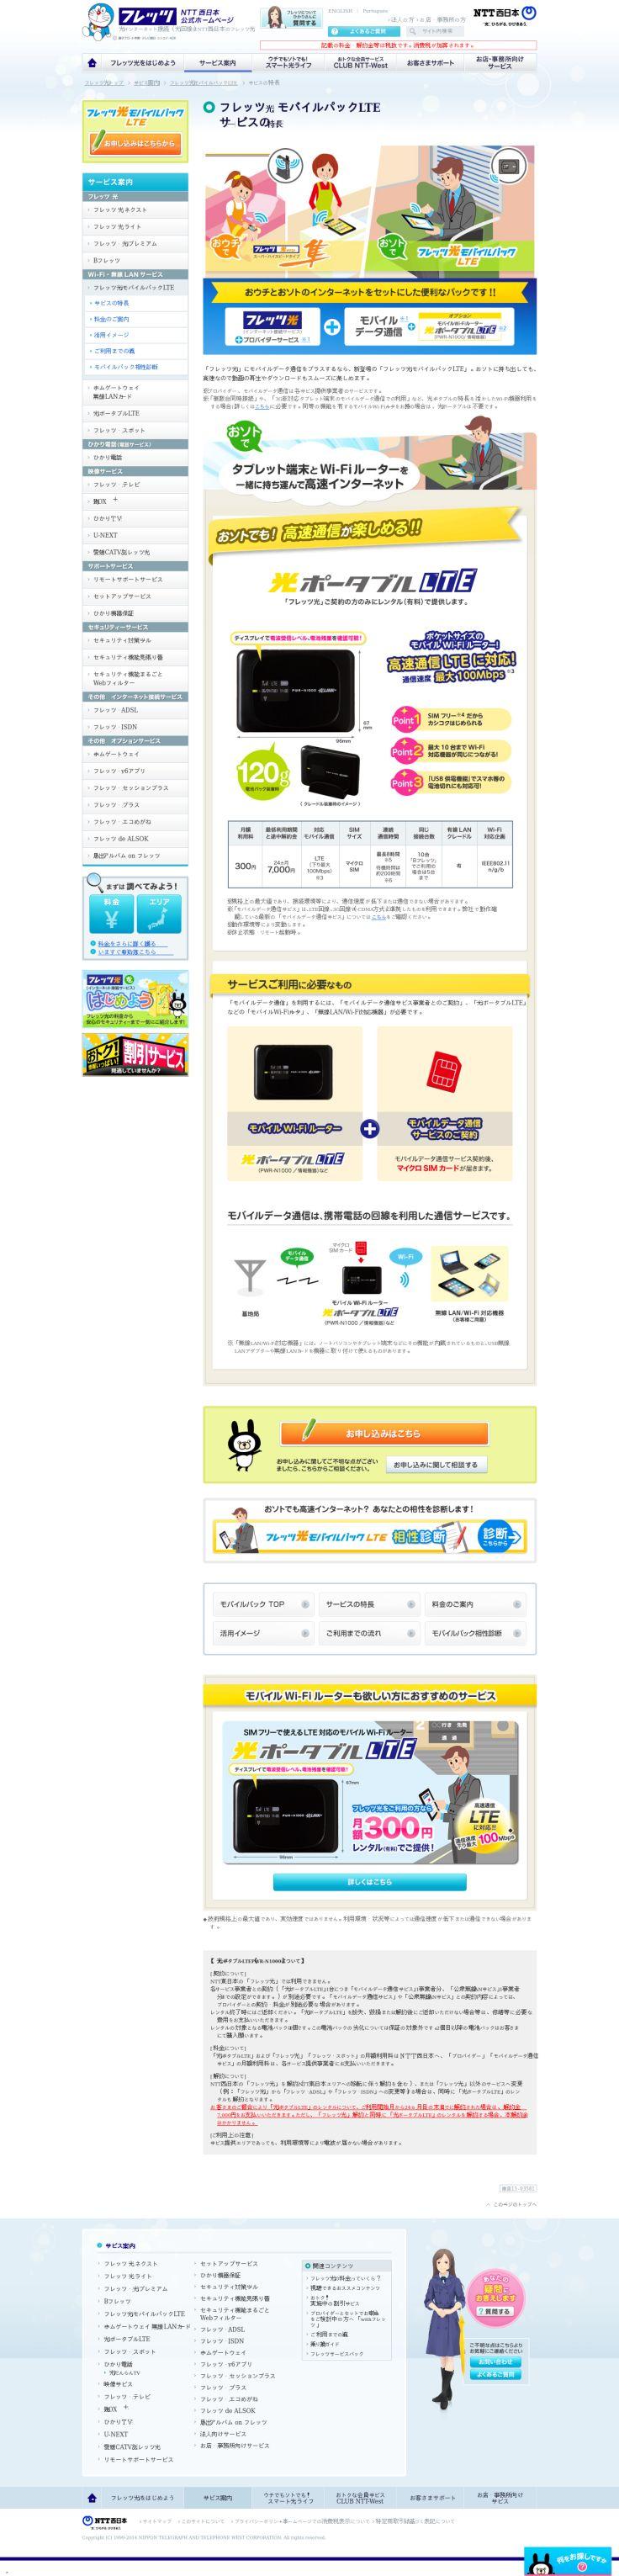 http://flets-w.com/wi-fi/mobilepack/tokuchou/